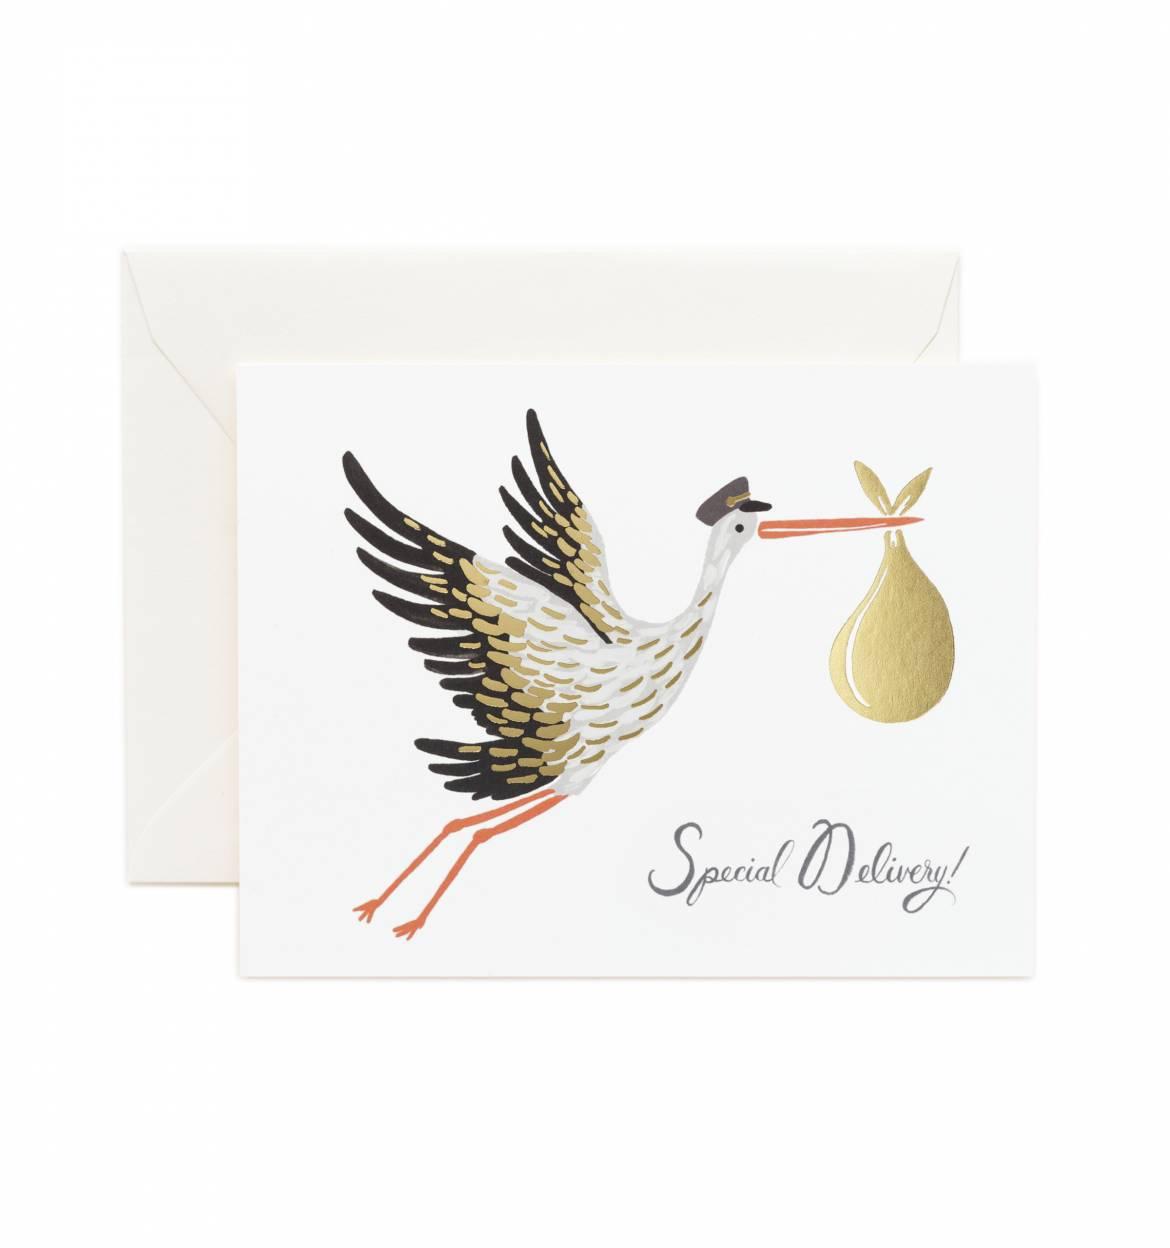 a2-gck010-baby-stork-01_1.jpg